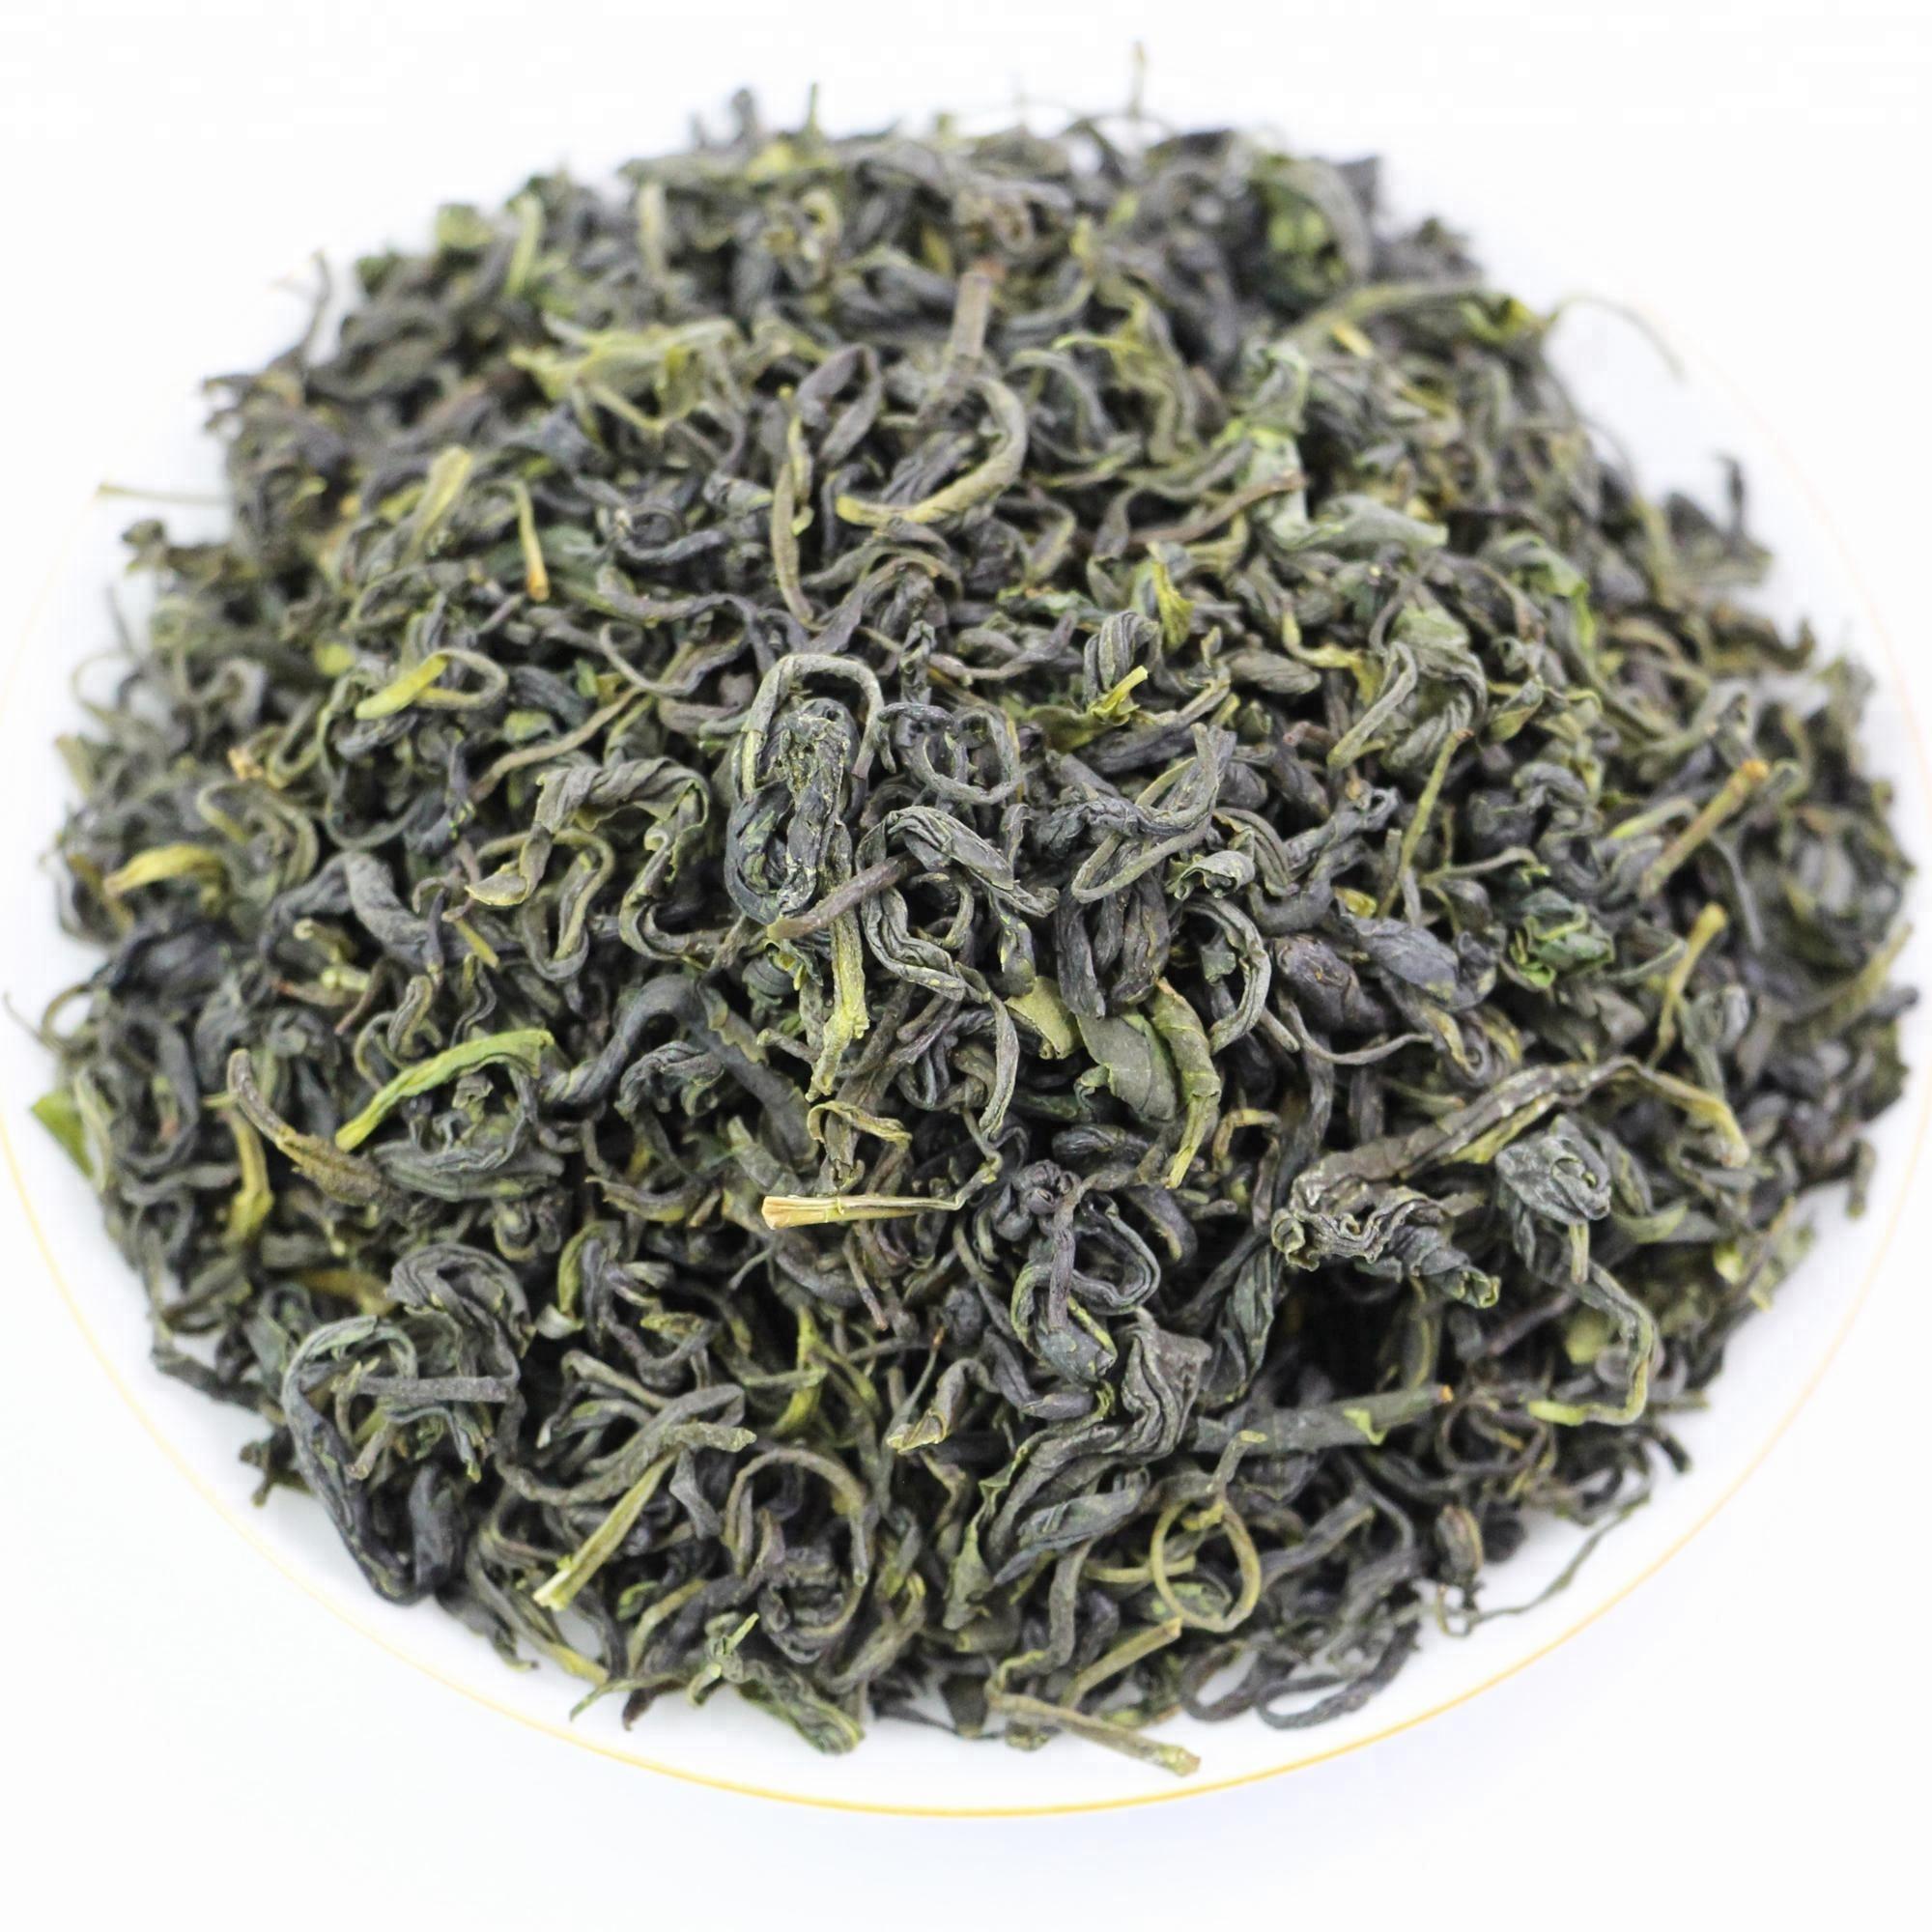 Best tea websites green tea halal cleanse tea green - 4uTea | 4uTea.com